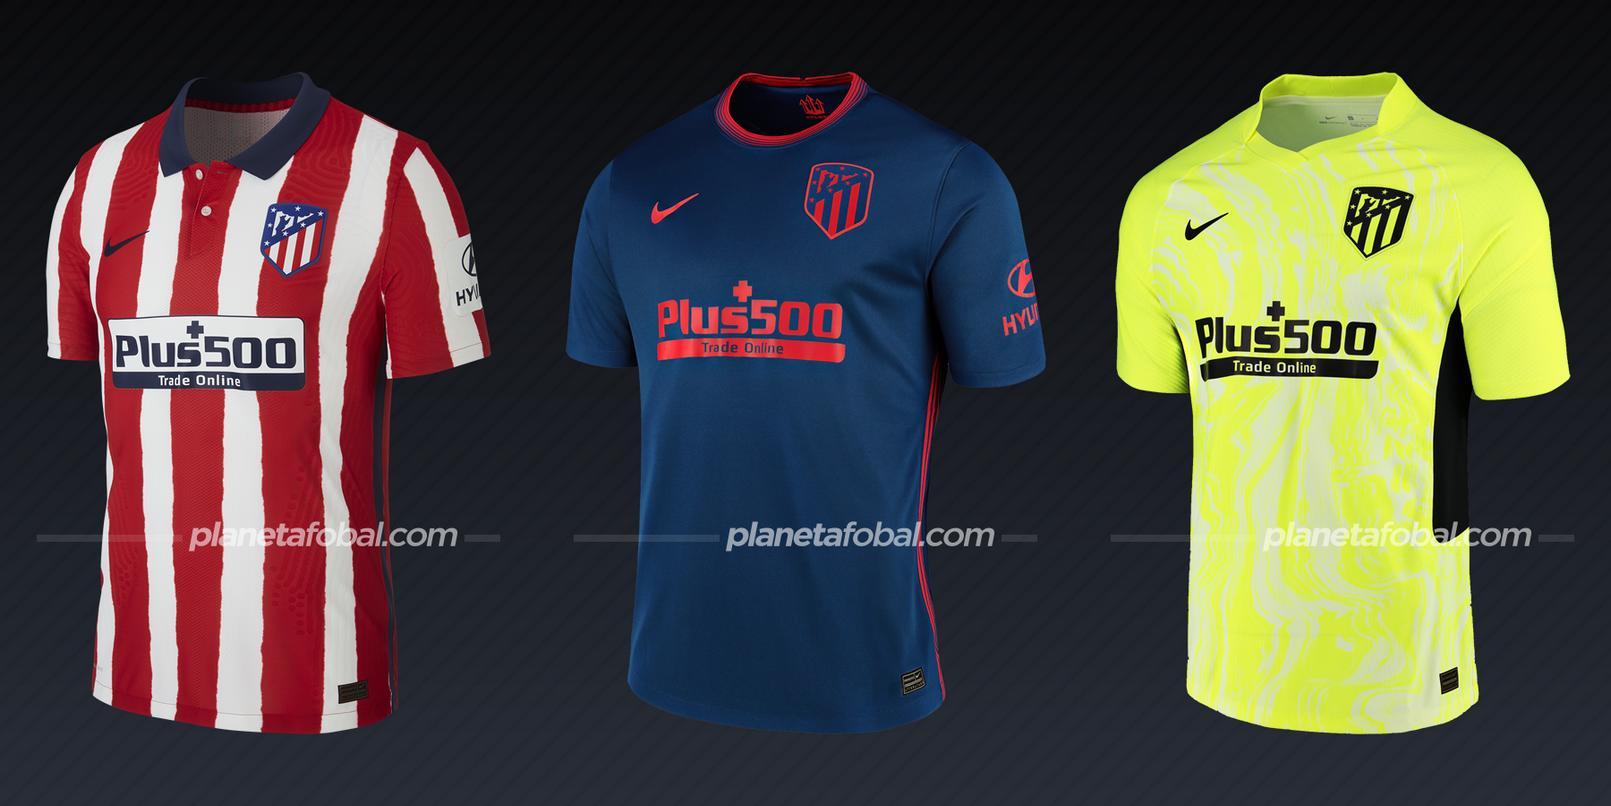 Atlético de Madrid (Nike) | Camisetas de la Champions League 2020/2021